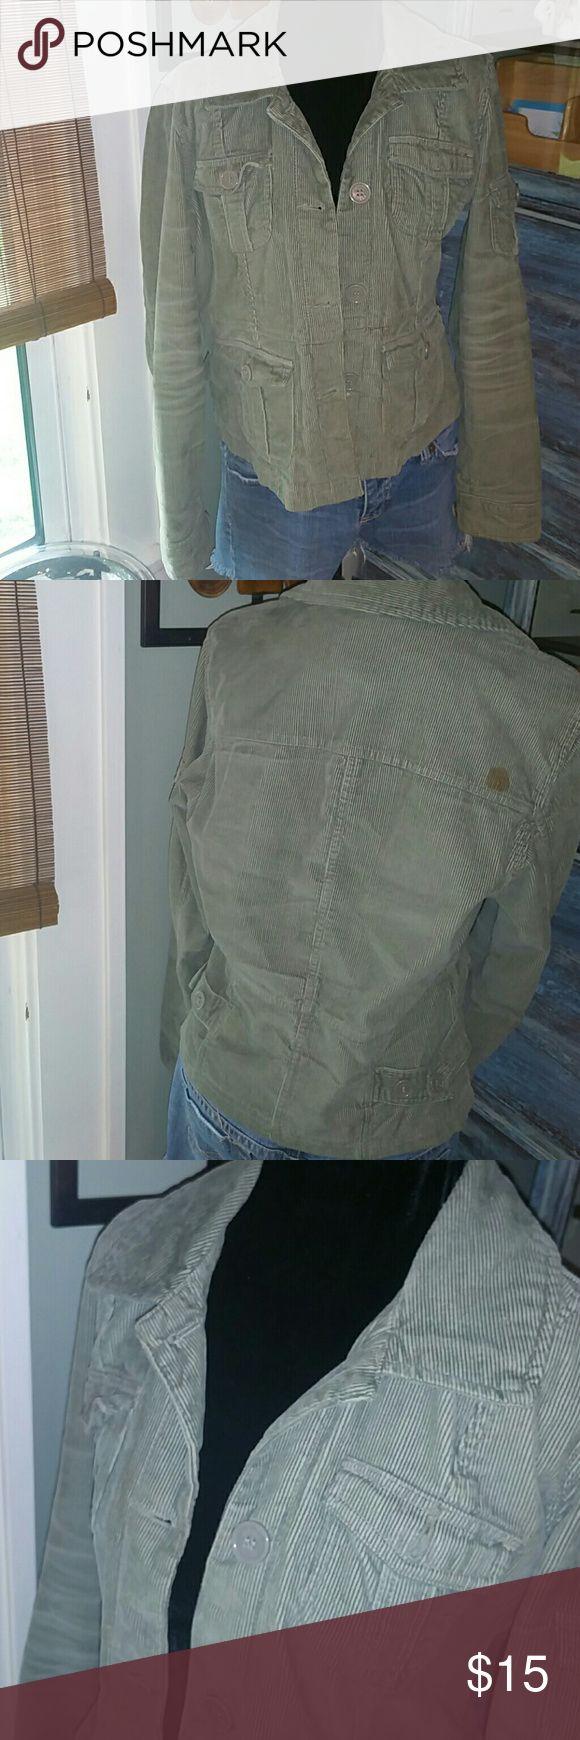 Sage green utility jacket Sage green utility jacket. Button missing on left breast pocket. Aeropostale Jackets & Coats Utility Jackets